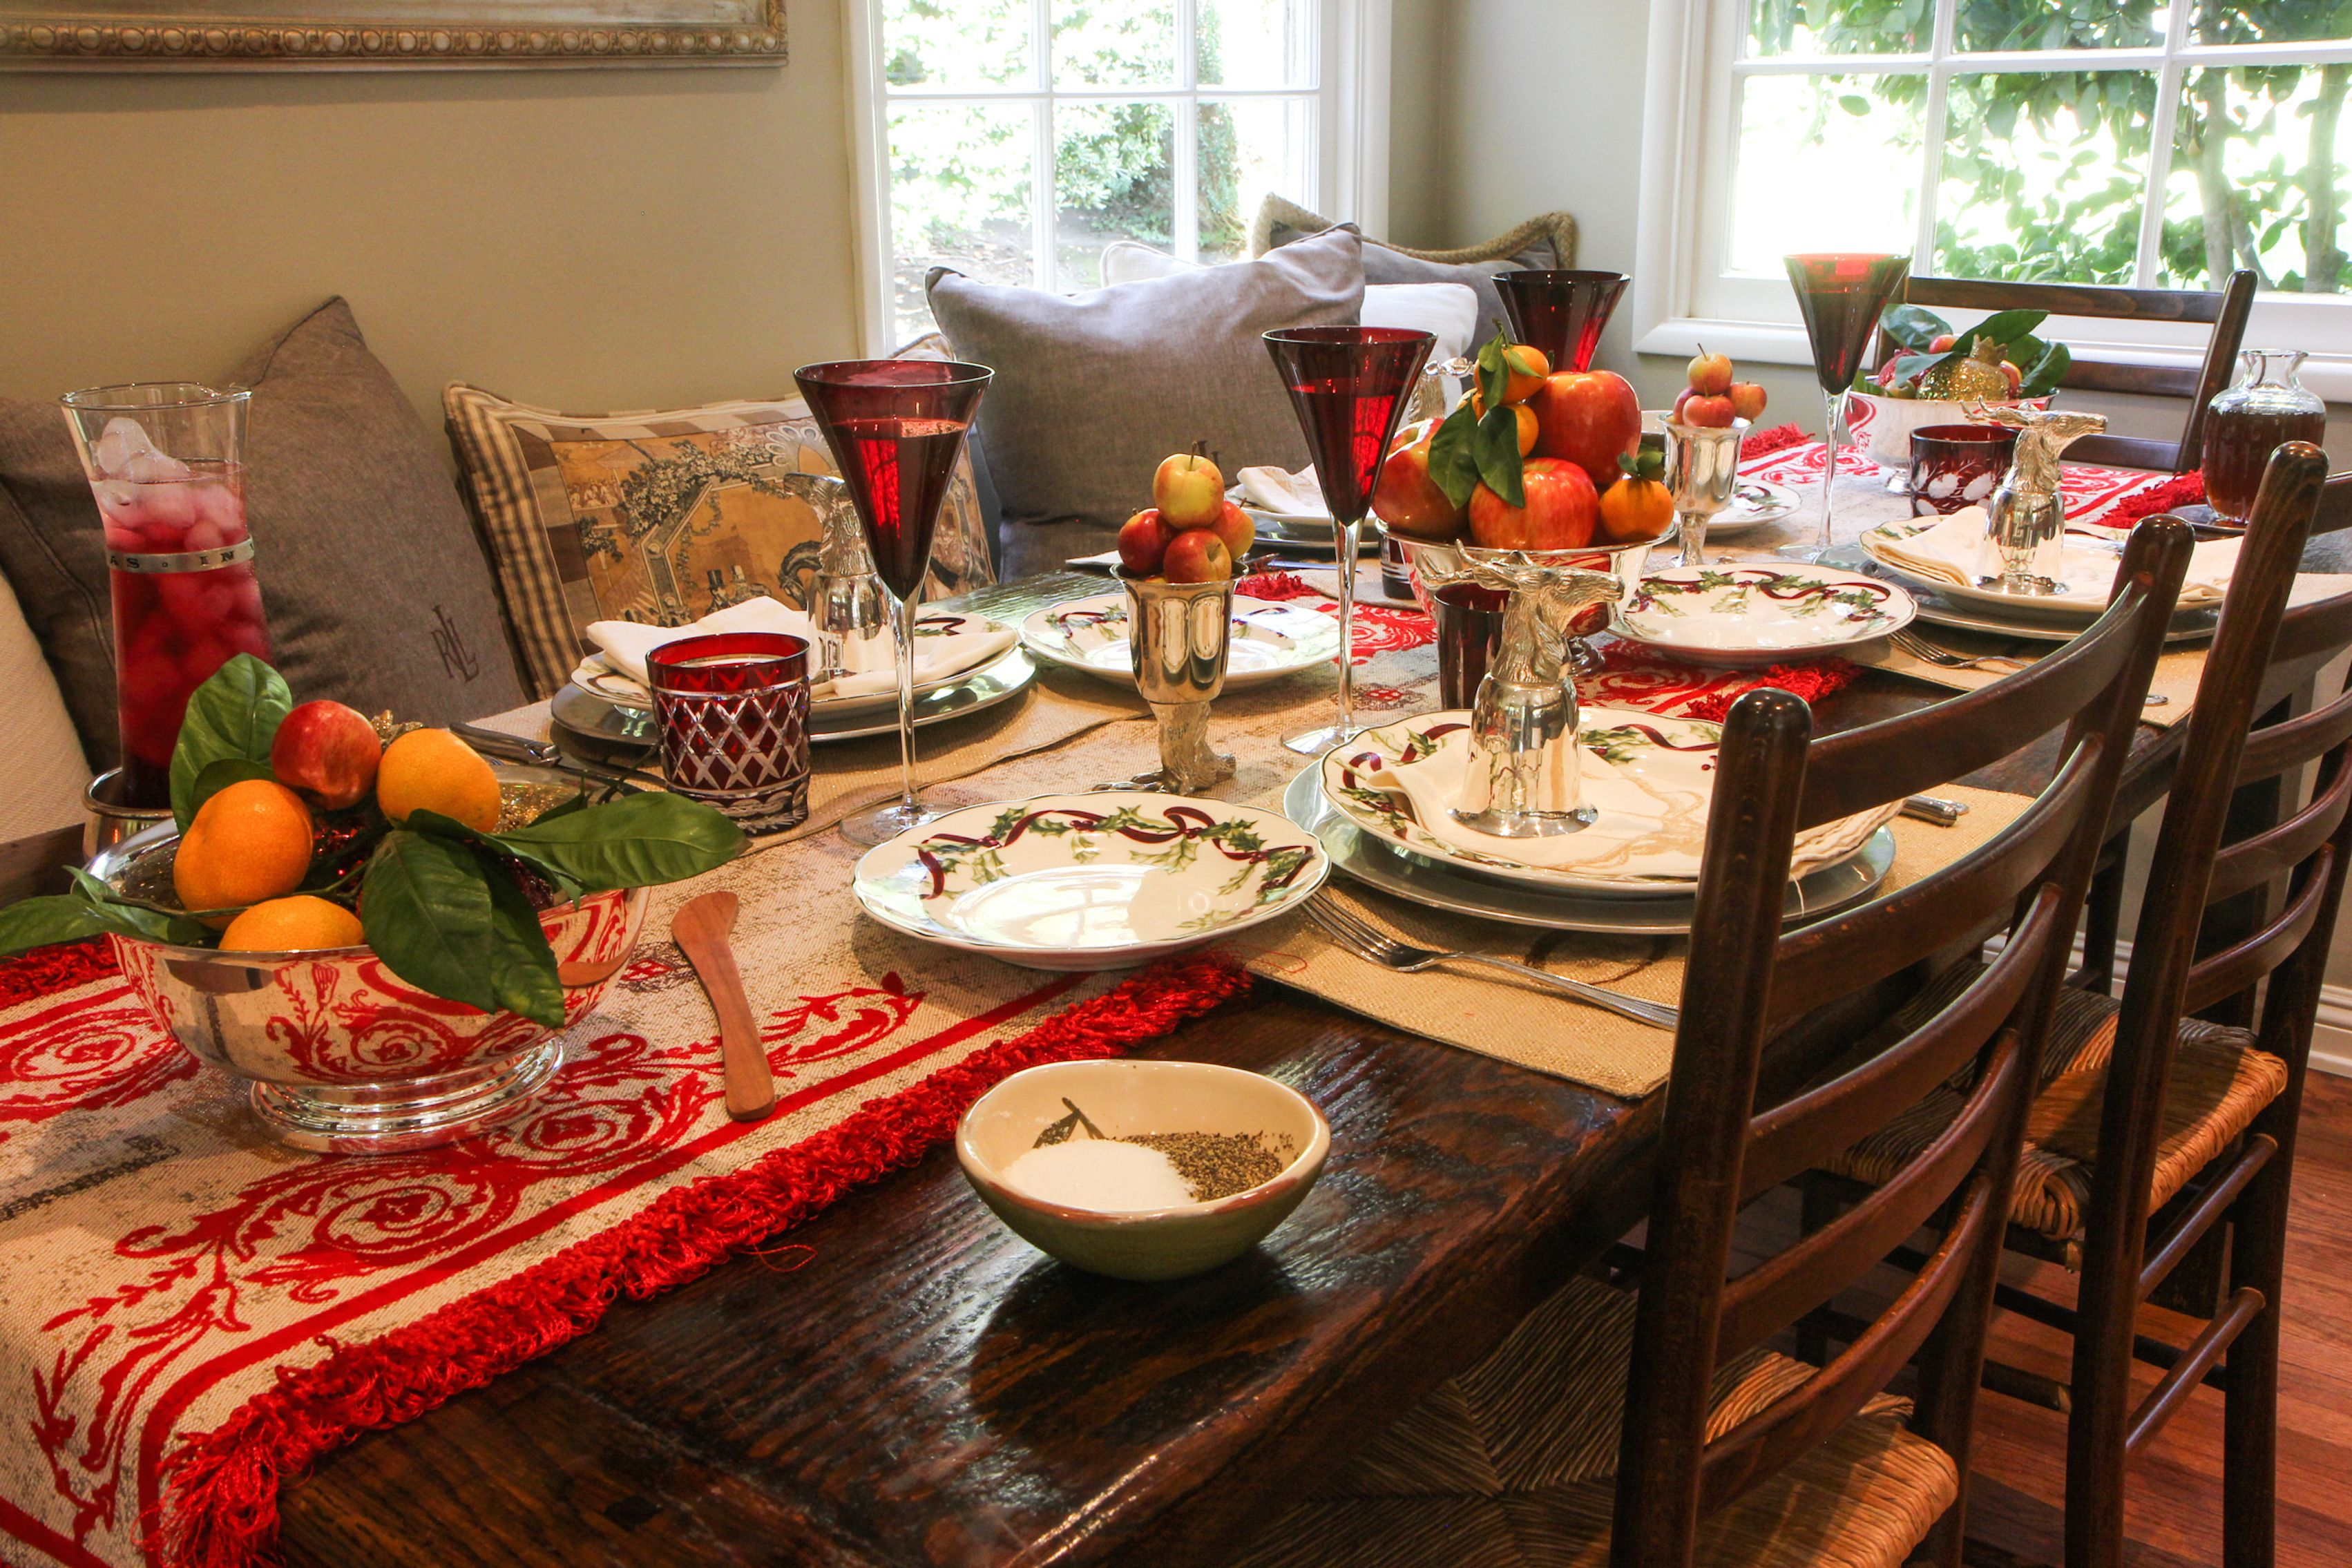 Christmas breakfast in sunny room